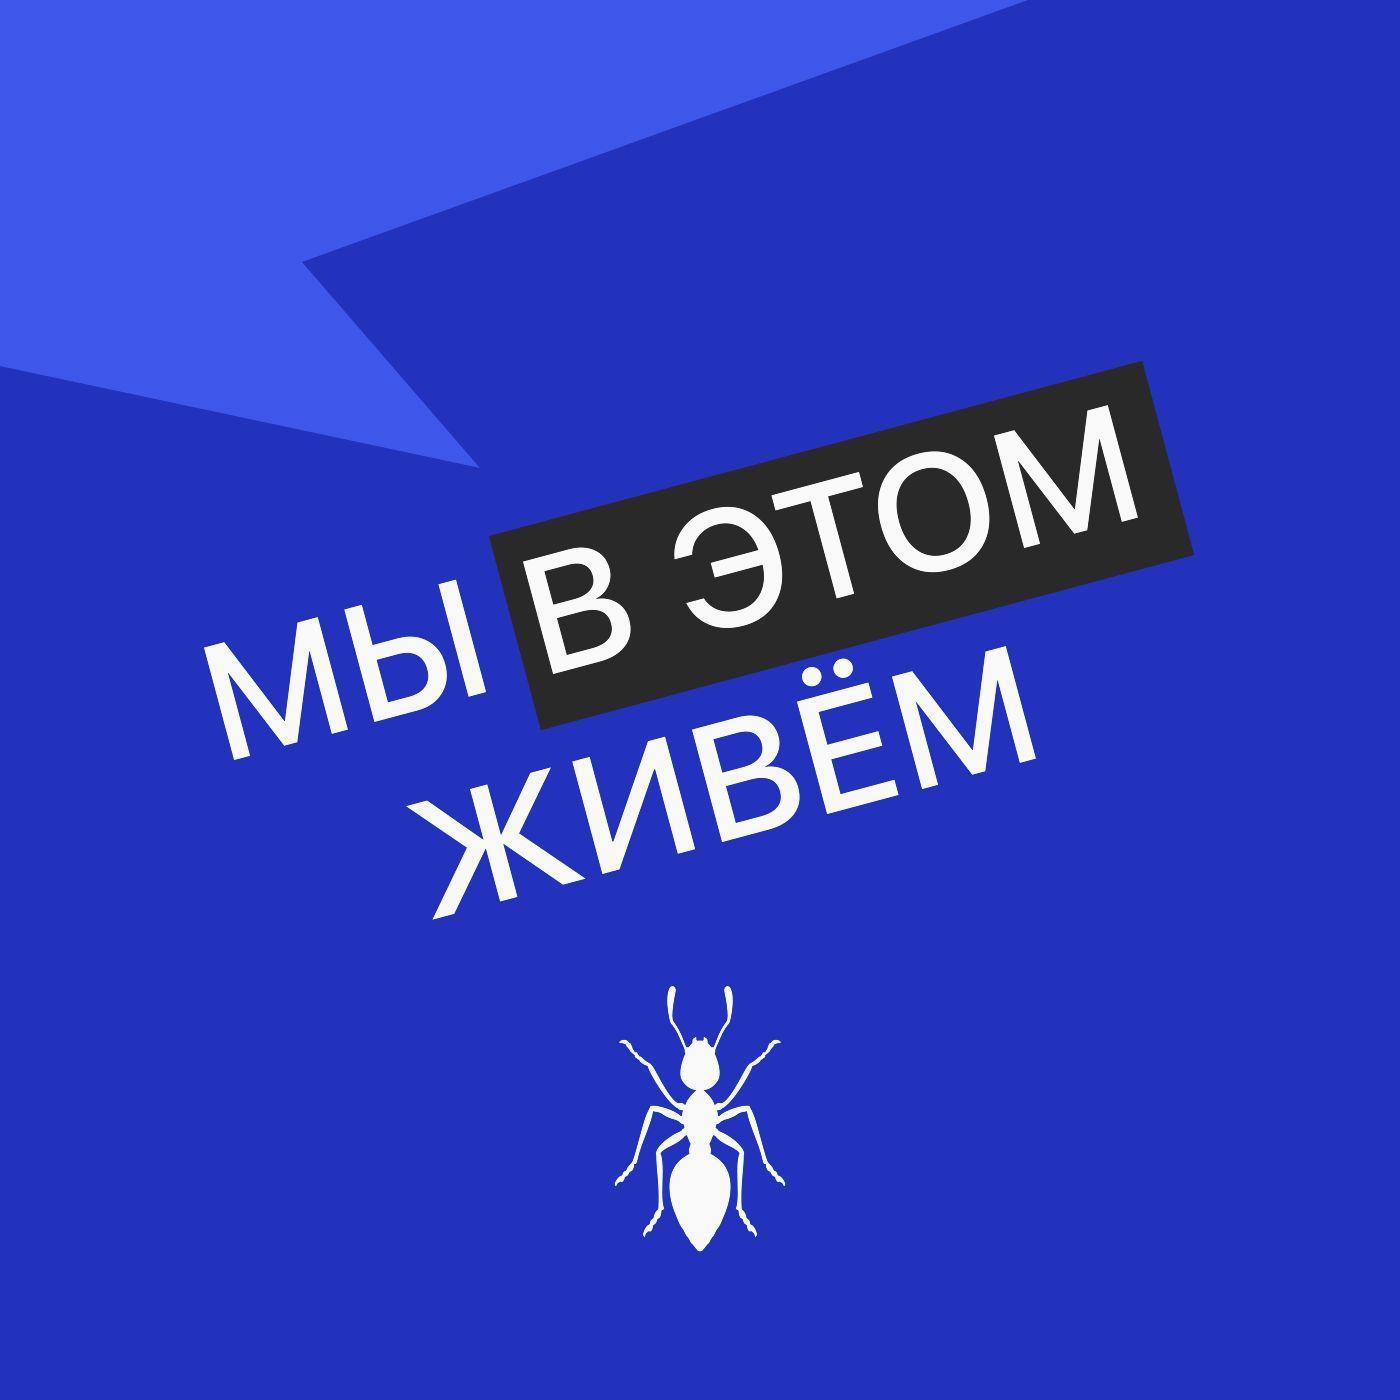 Творческий коллектив Mojomedia Выпуск № 13 сезон 3 Отряд Титямболдора